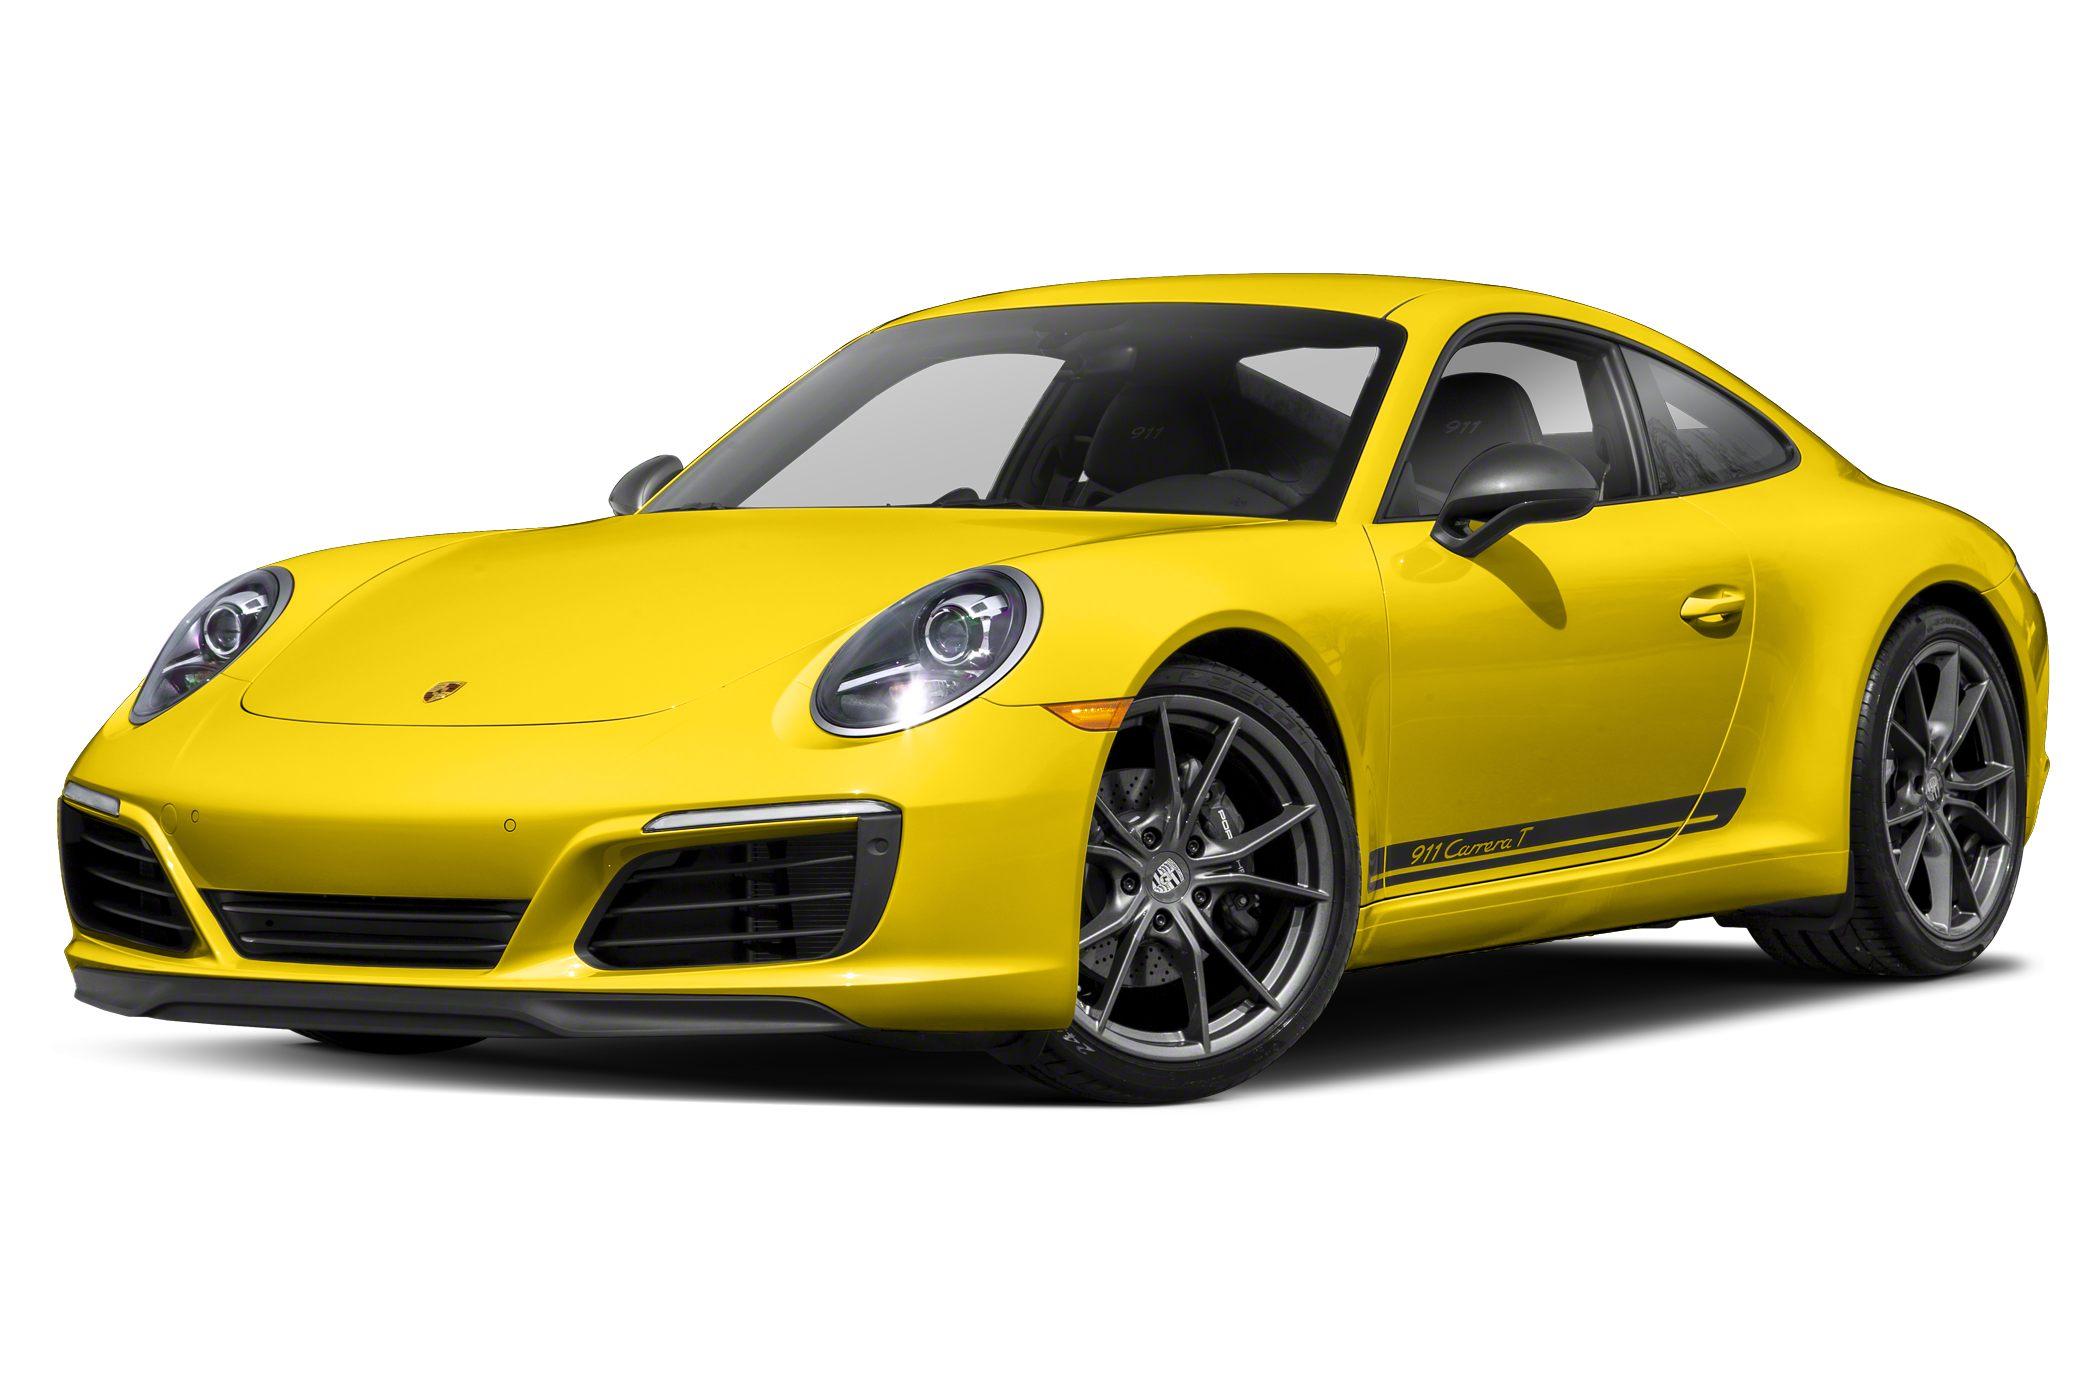 2019 Porsche 911 Carrera T 2dr Rear-wheel Drive Coupe